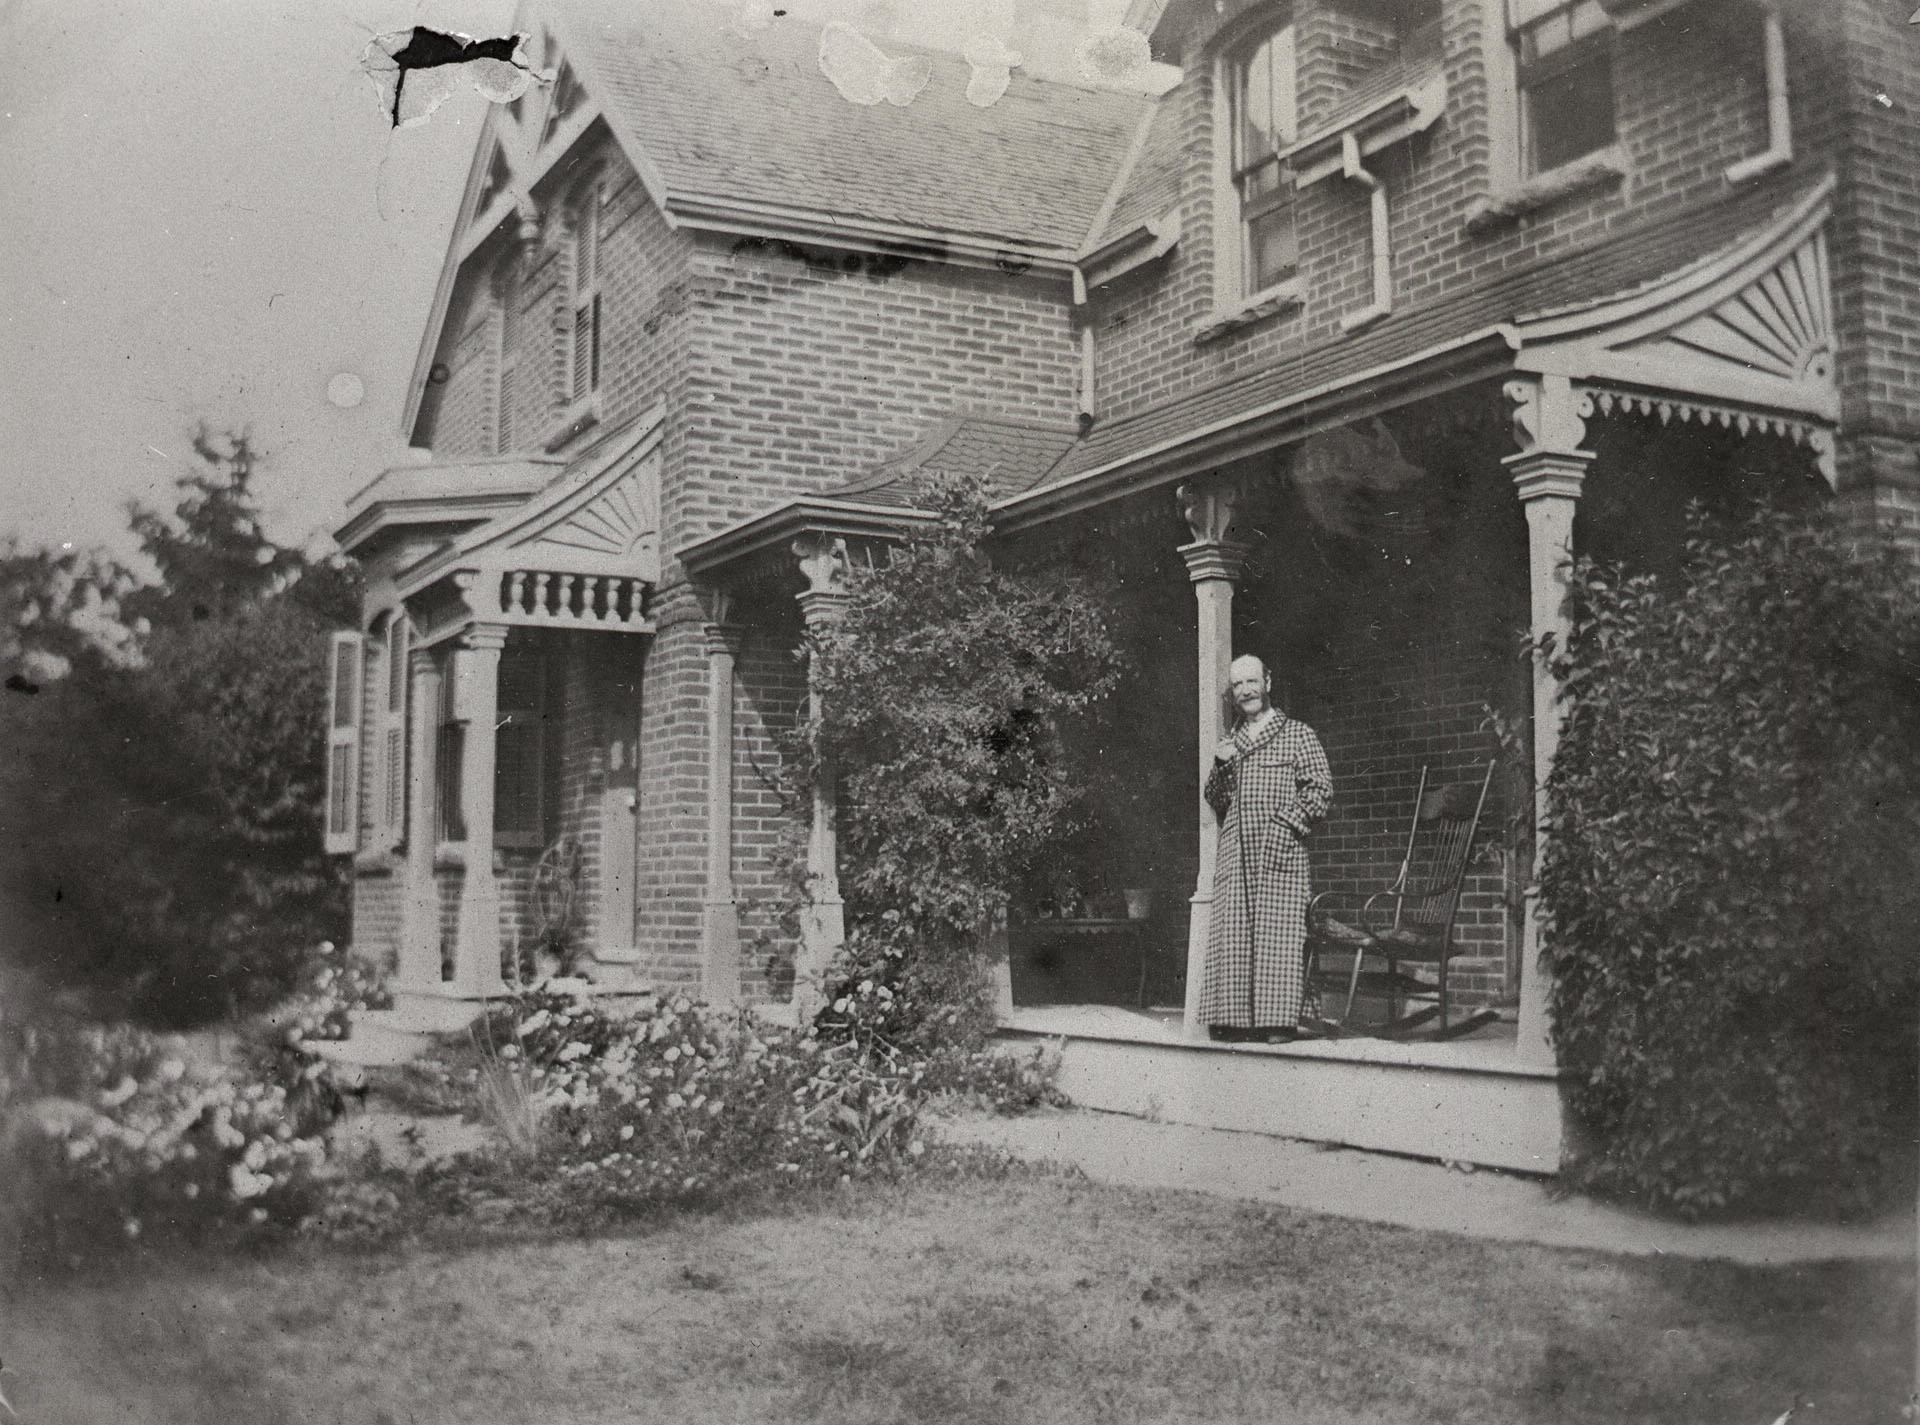 Thomas Heys, Hogarth and Bowden, 1900